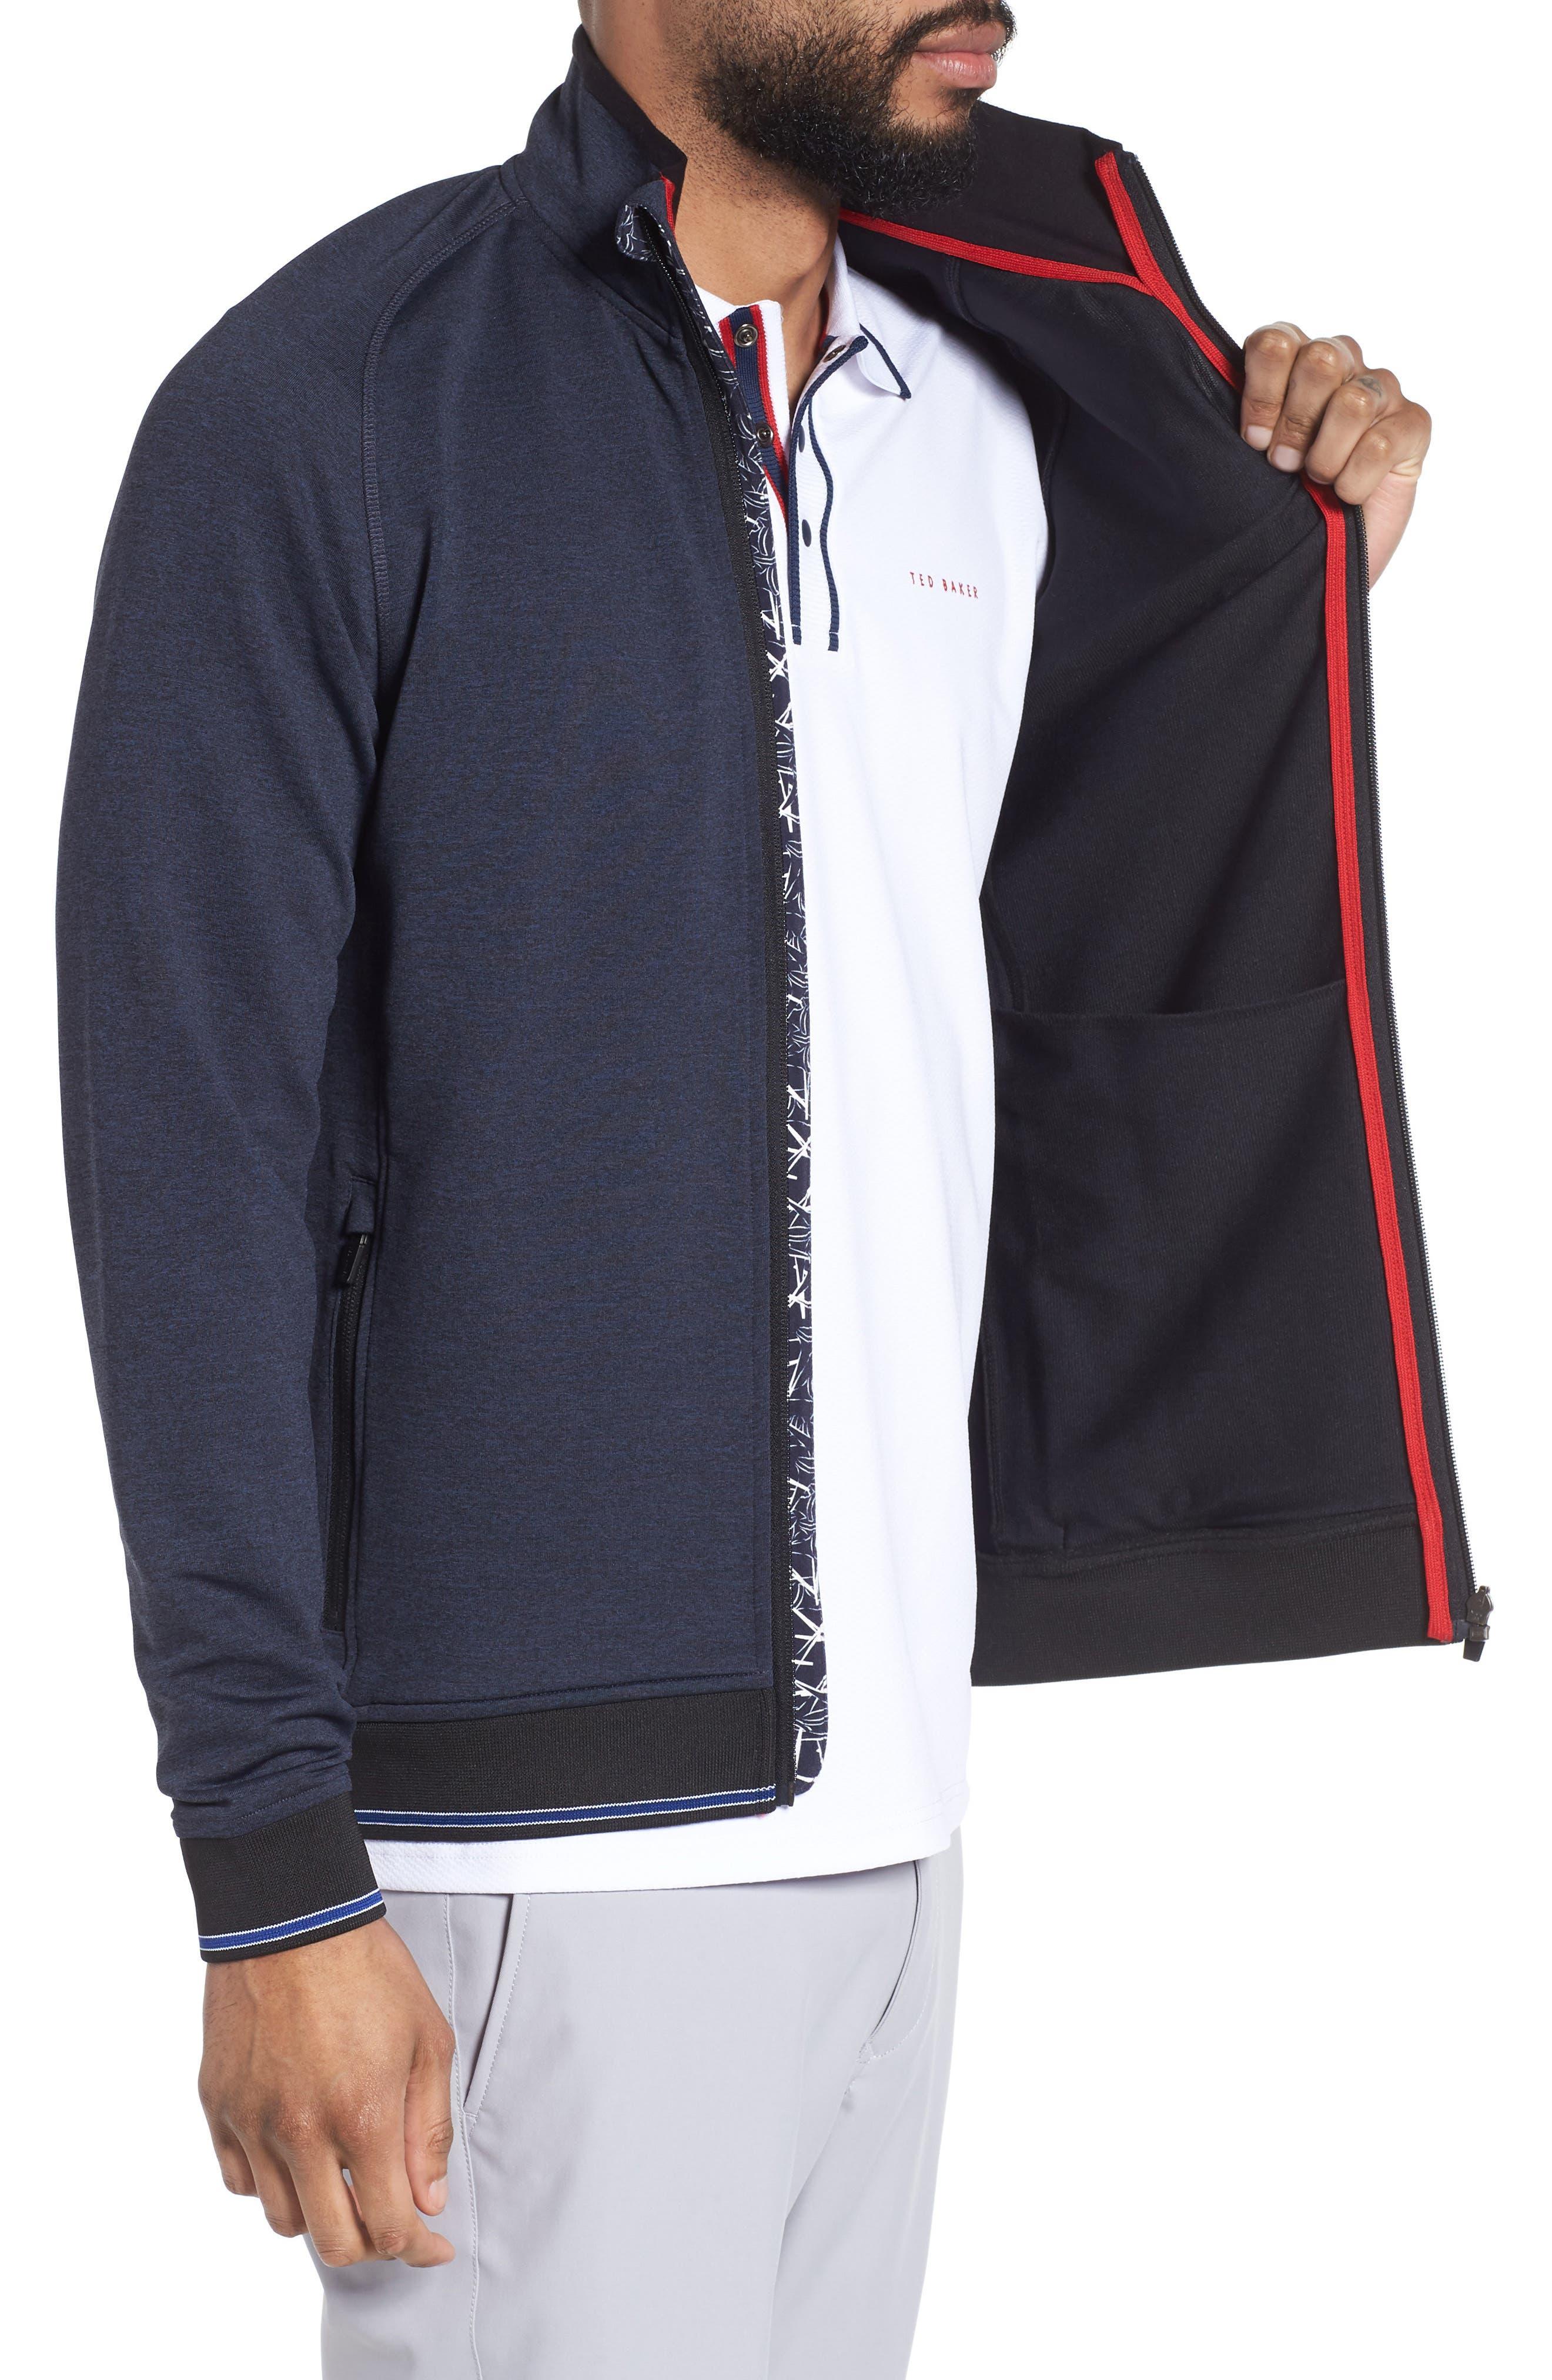 Parway Knit Golf Jacket,                             Alternate thumbnail 3, color,                             410